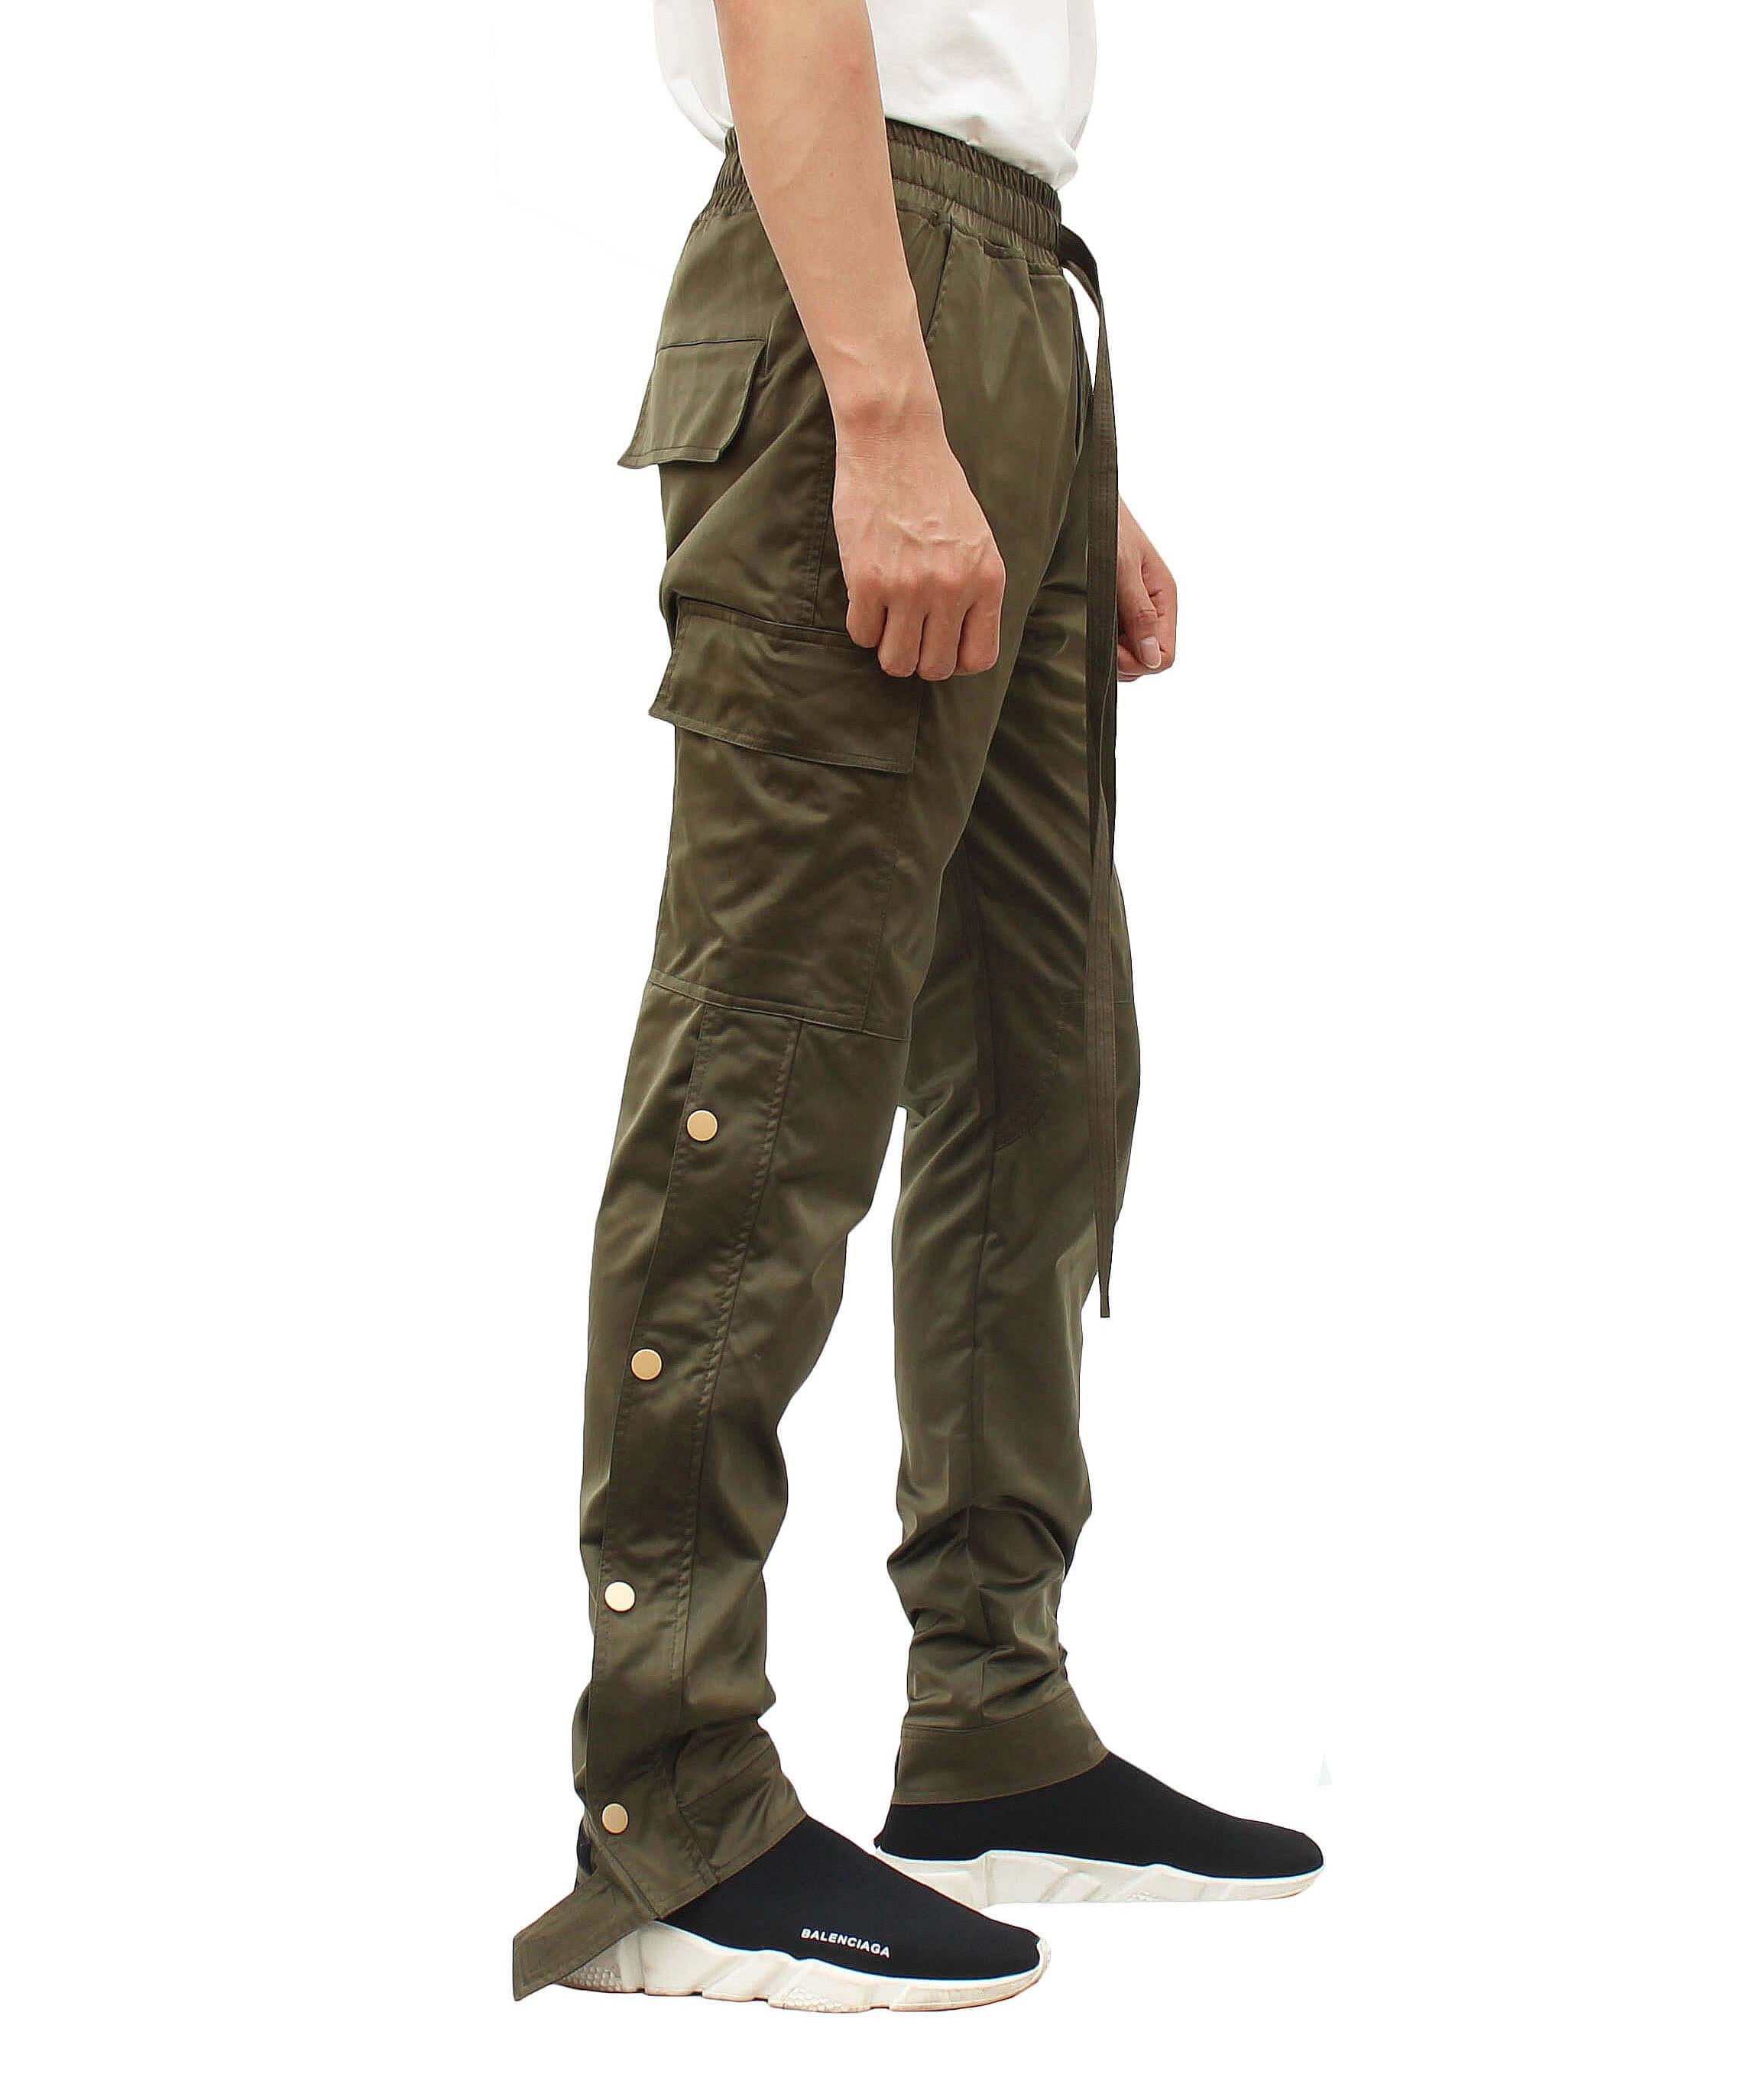 Nylon Cargo Snap Pants - Olive